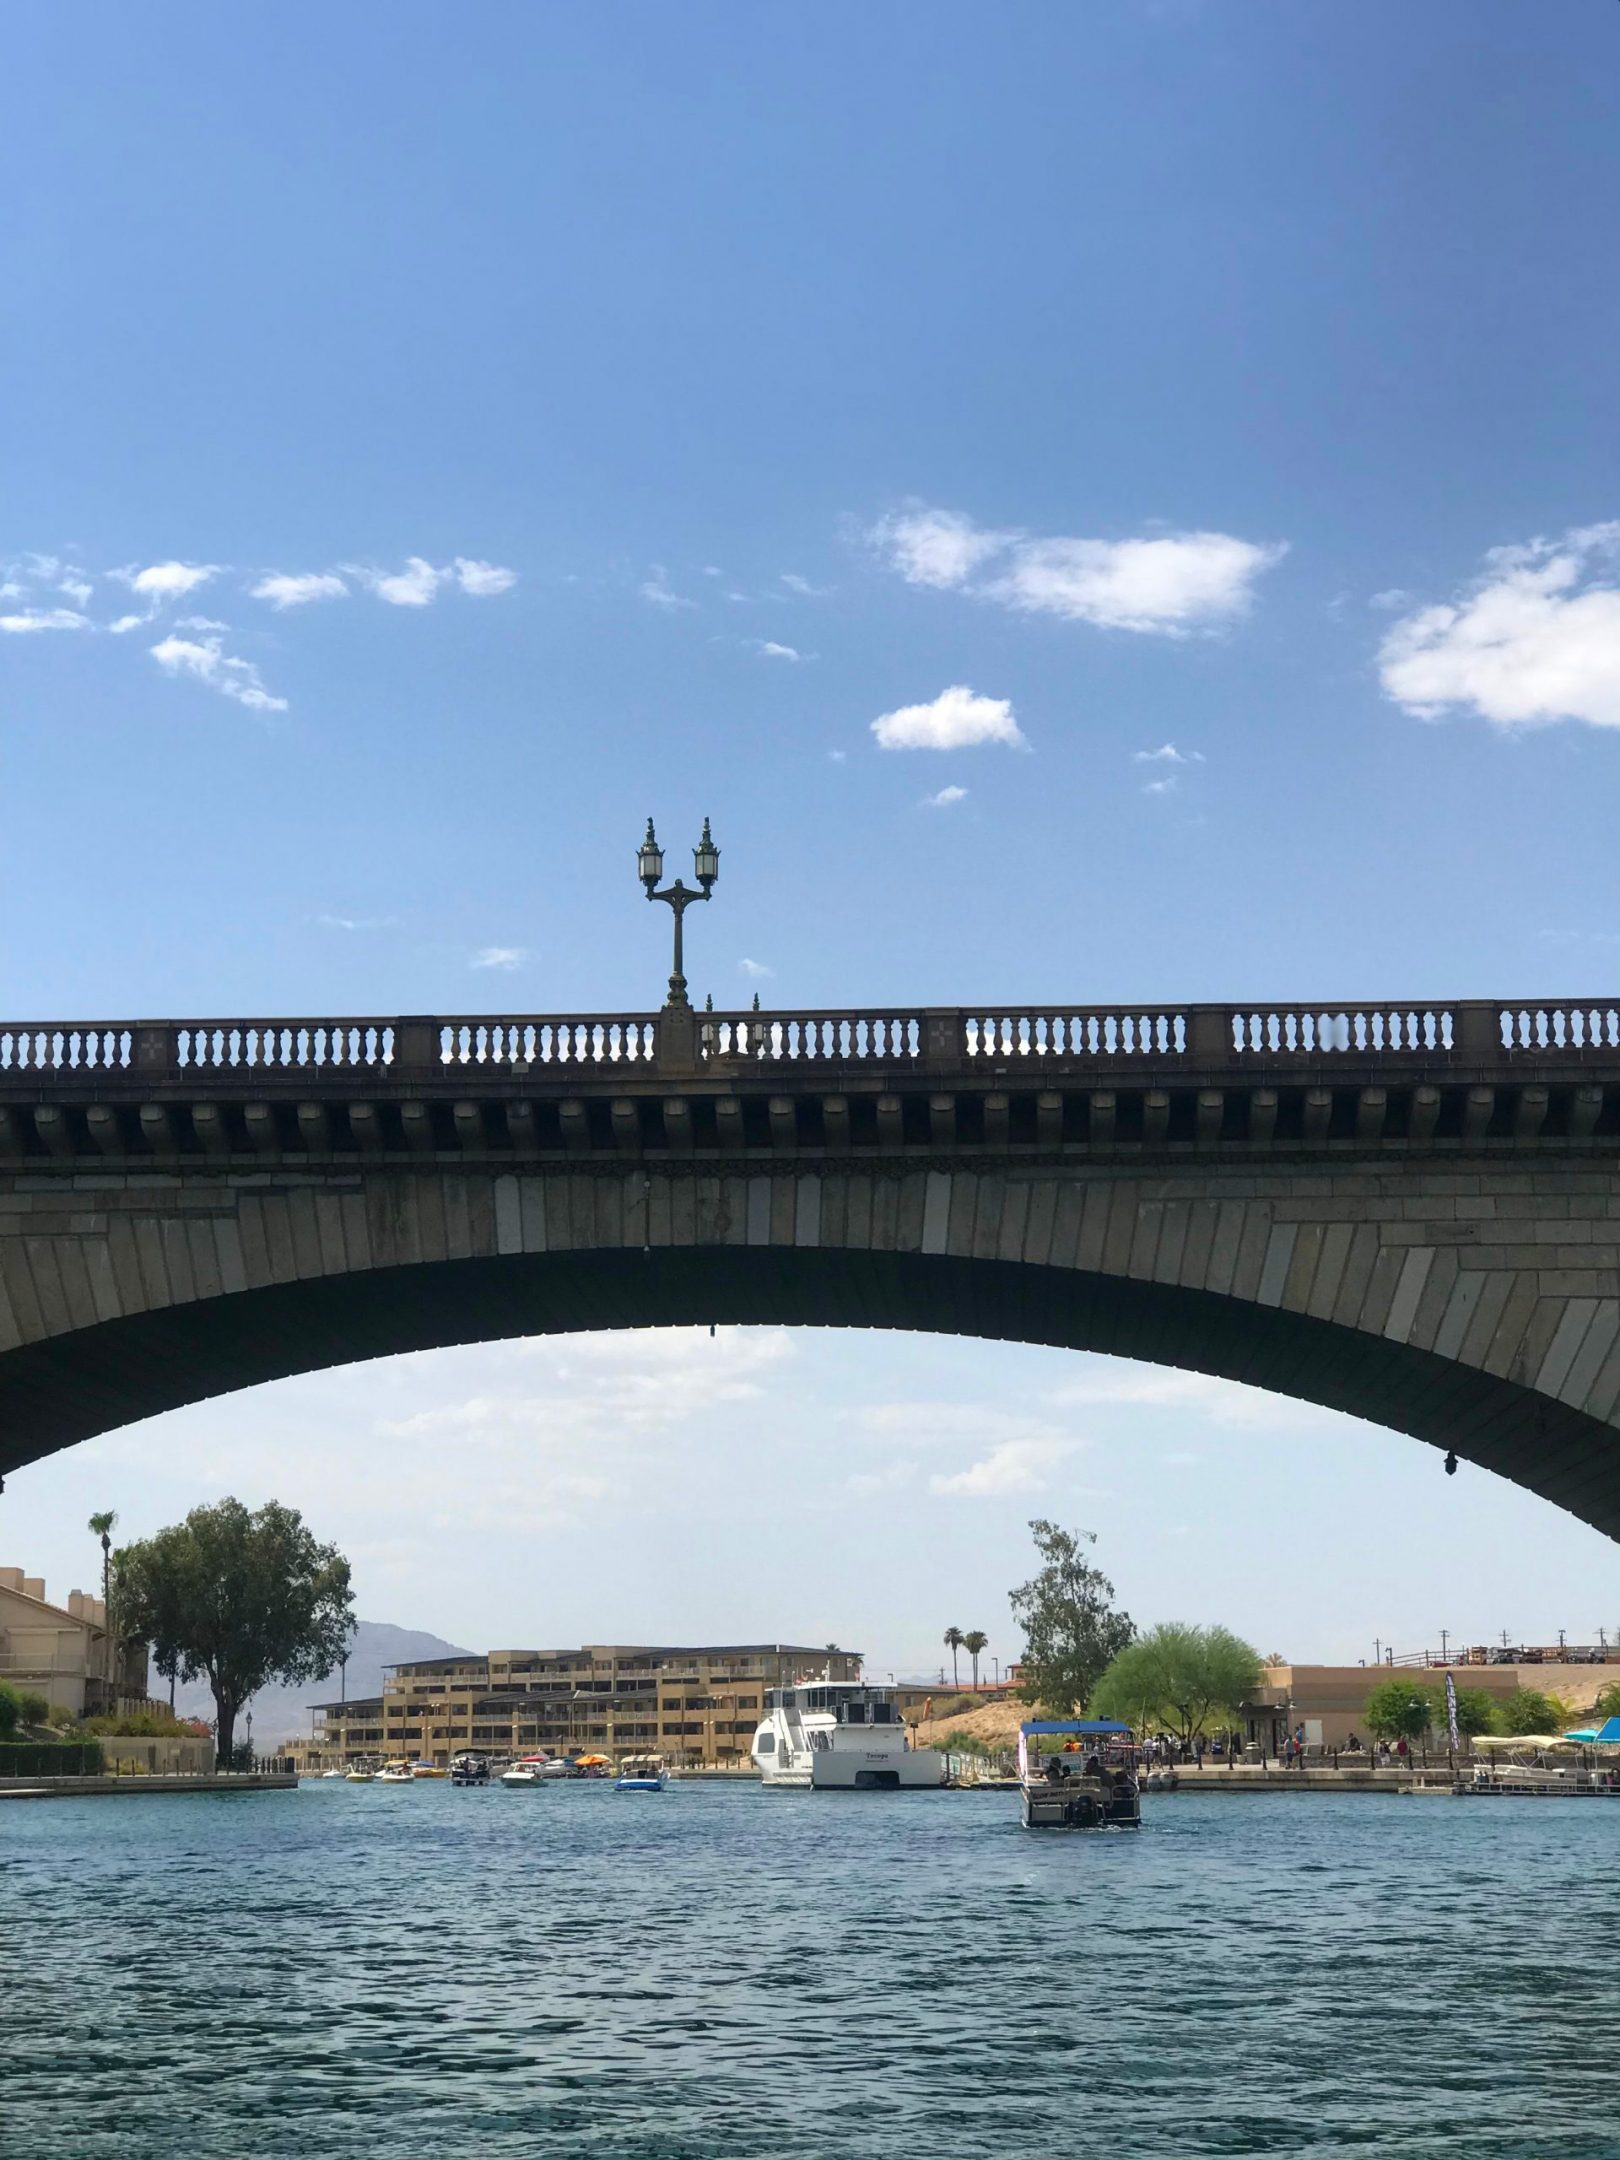 The London Bridge over Lake Havasu